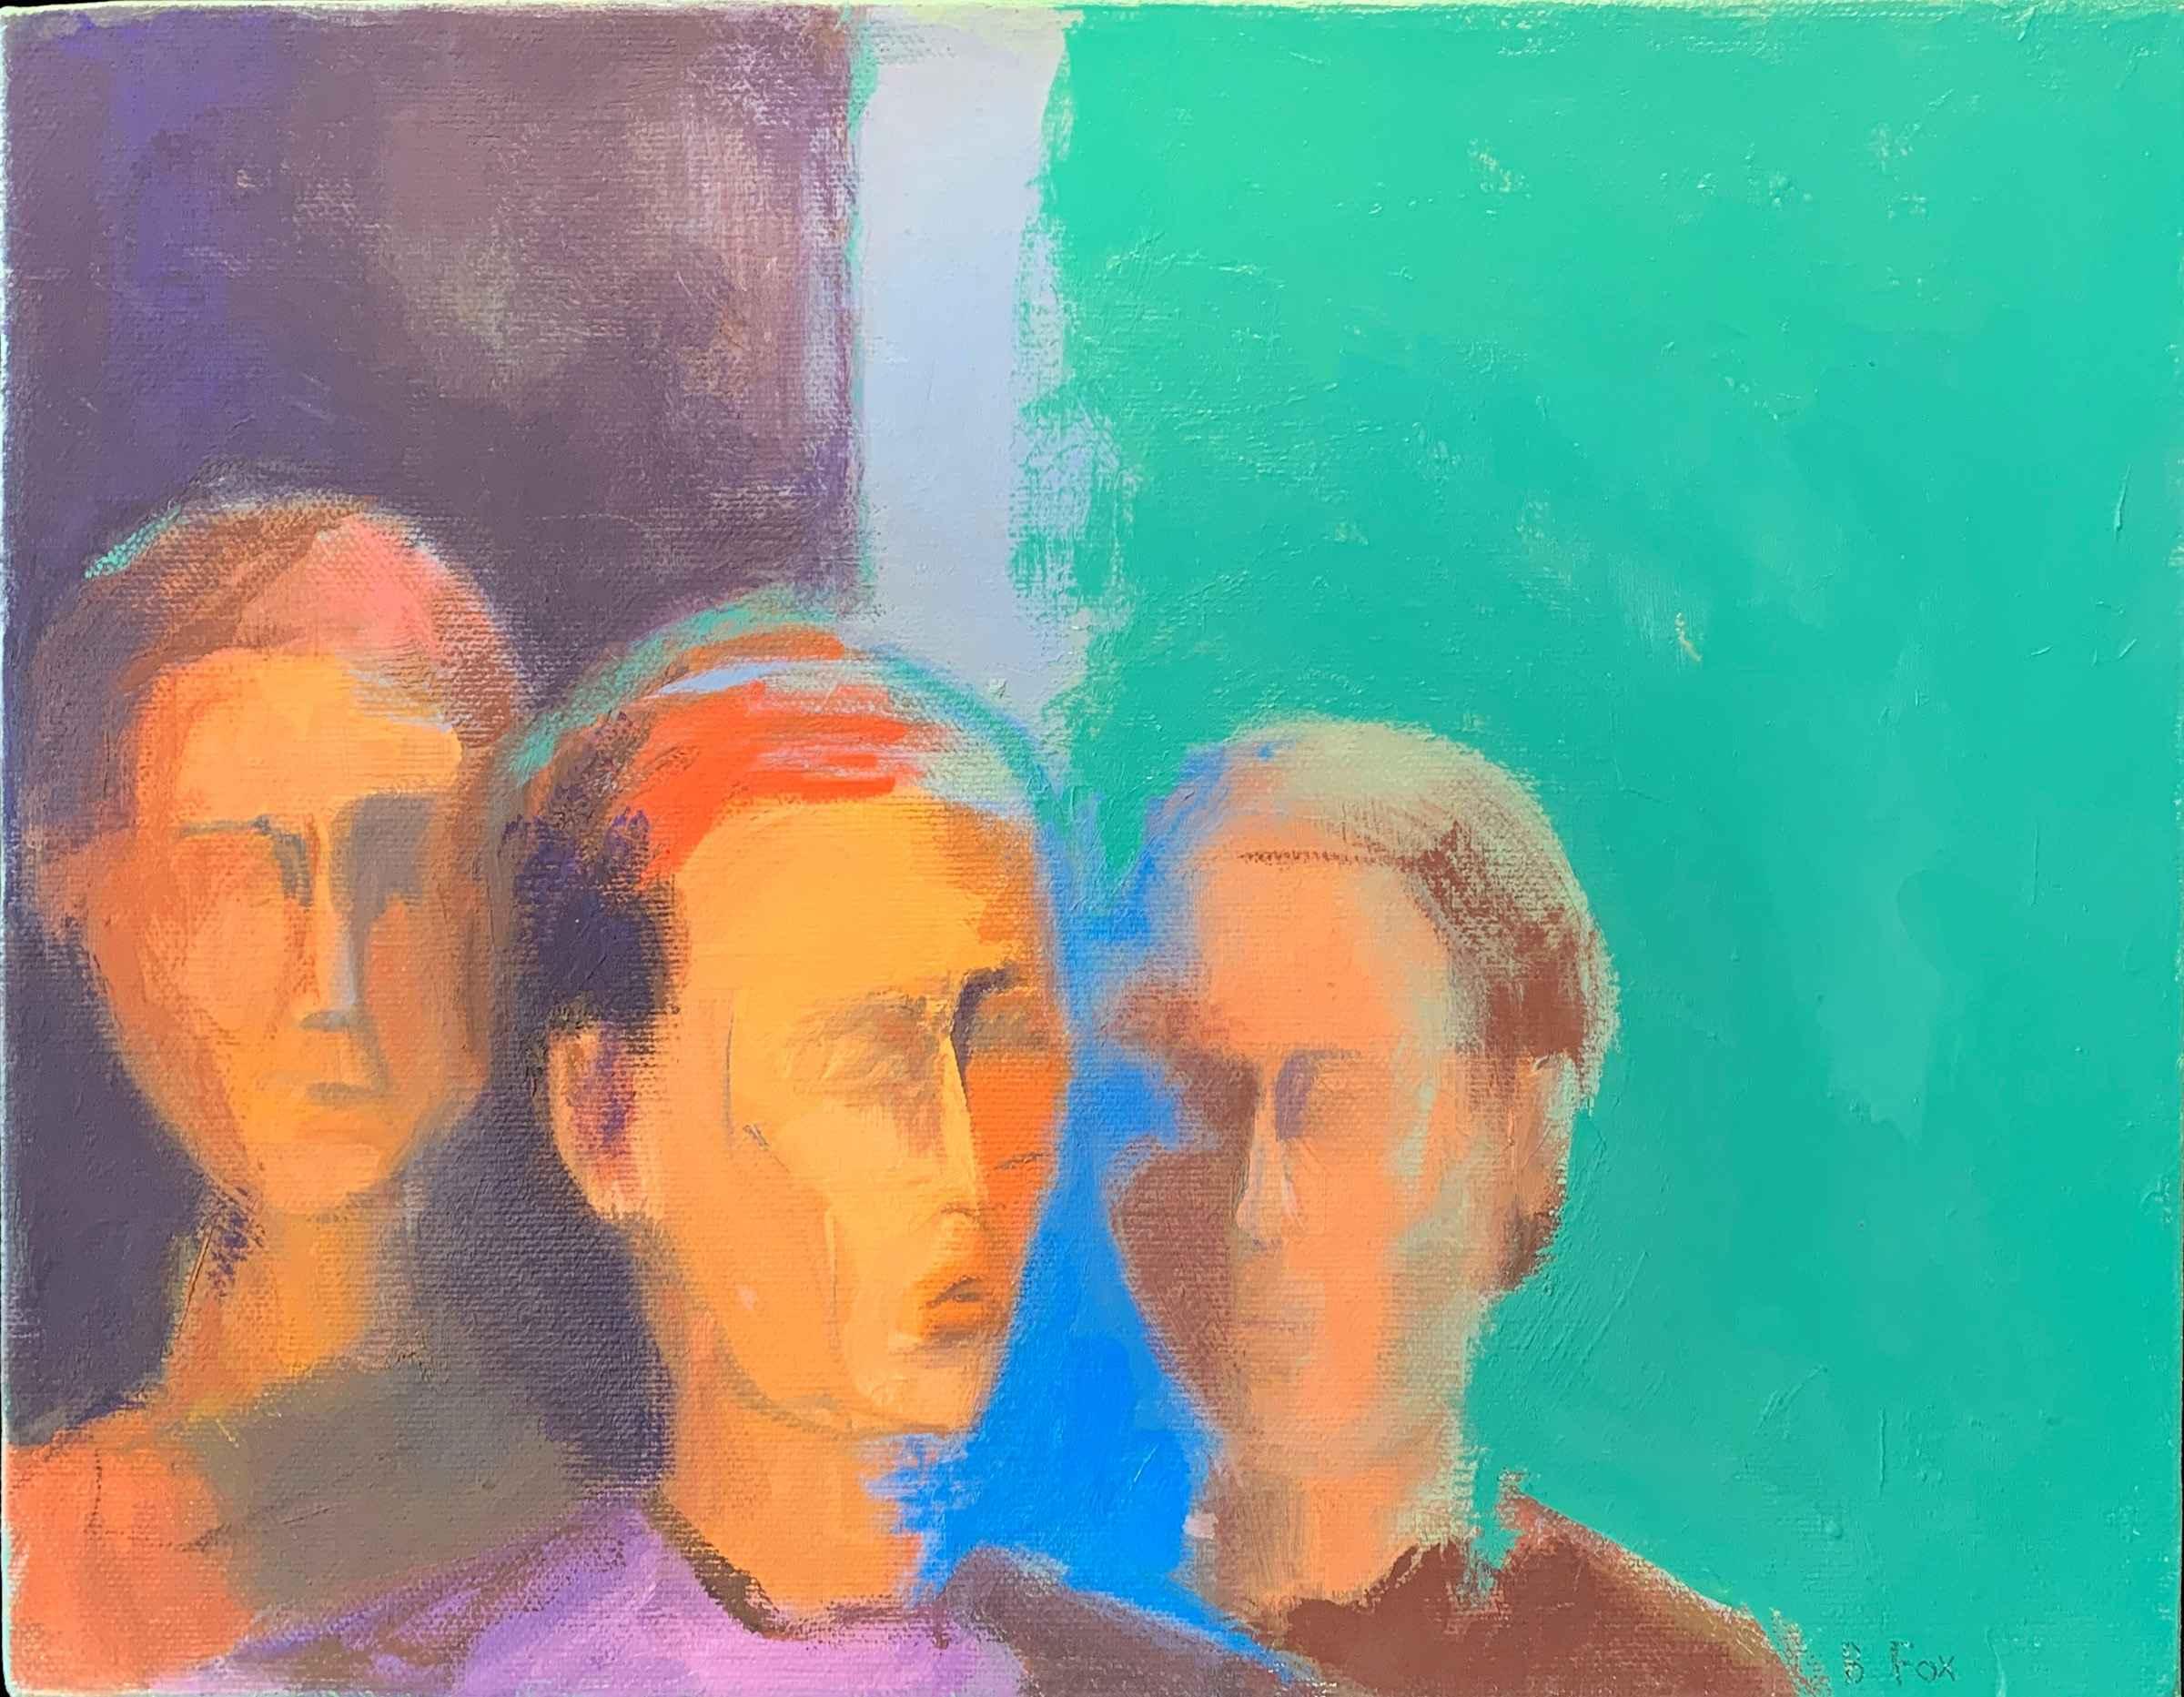 Three Faces by  Brenda Fox - Masterpiece Online